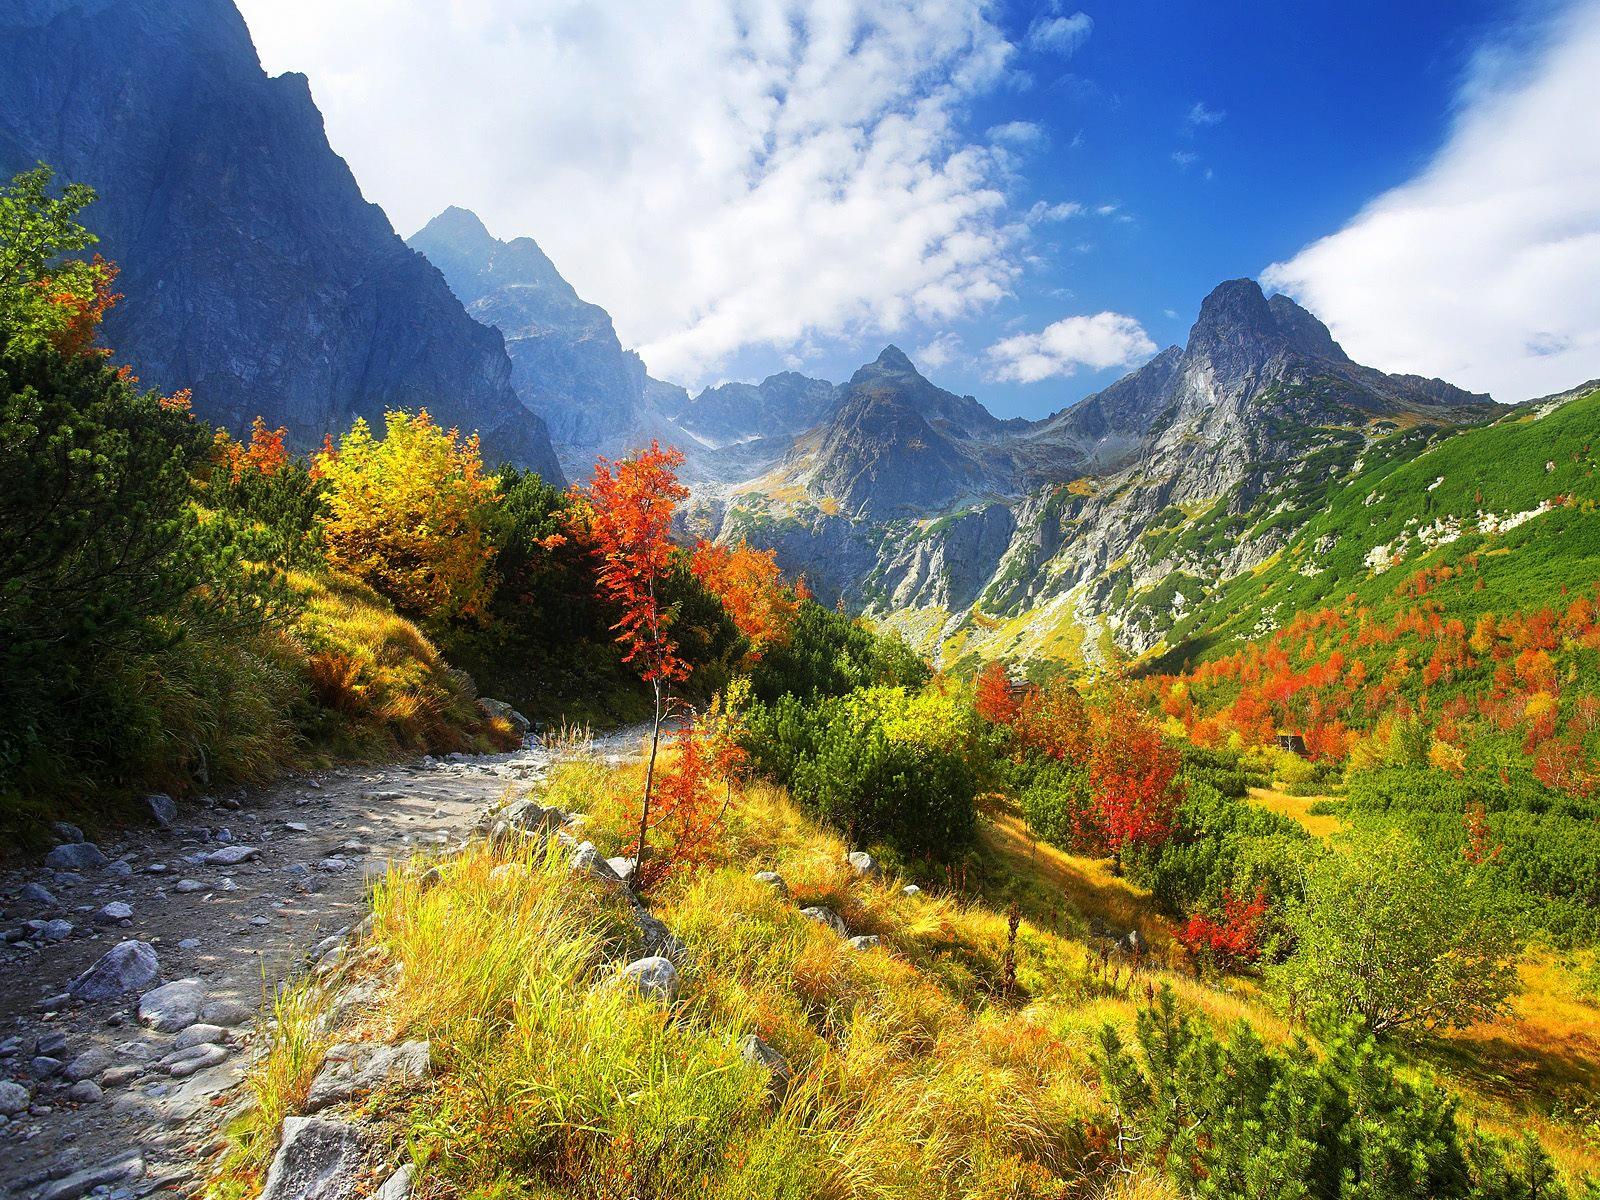 Mountain path sunny autumn day for Paesaggi autunnali per desktop